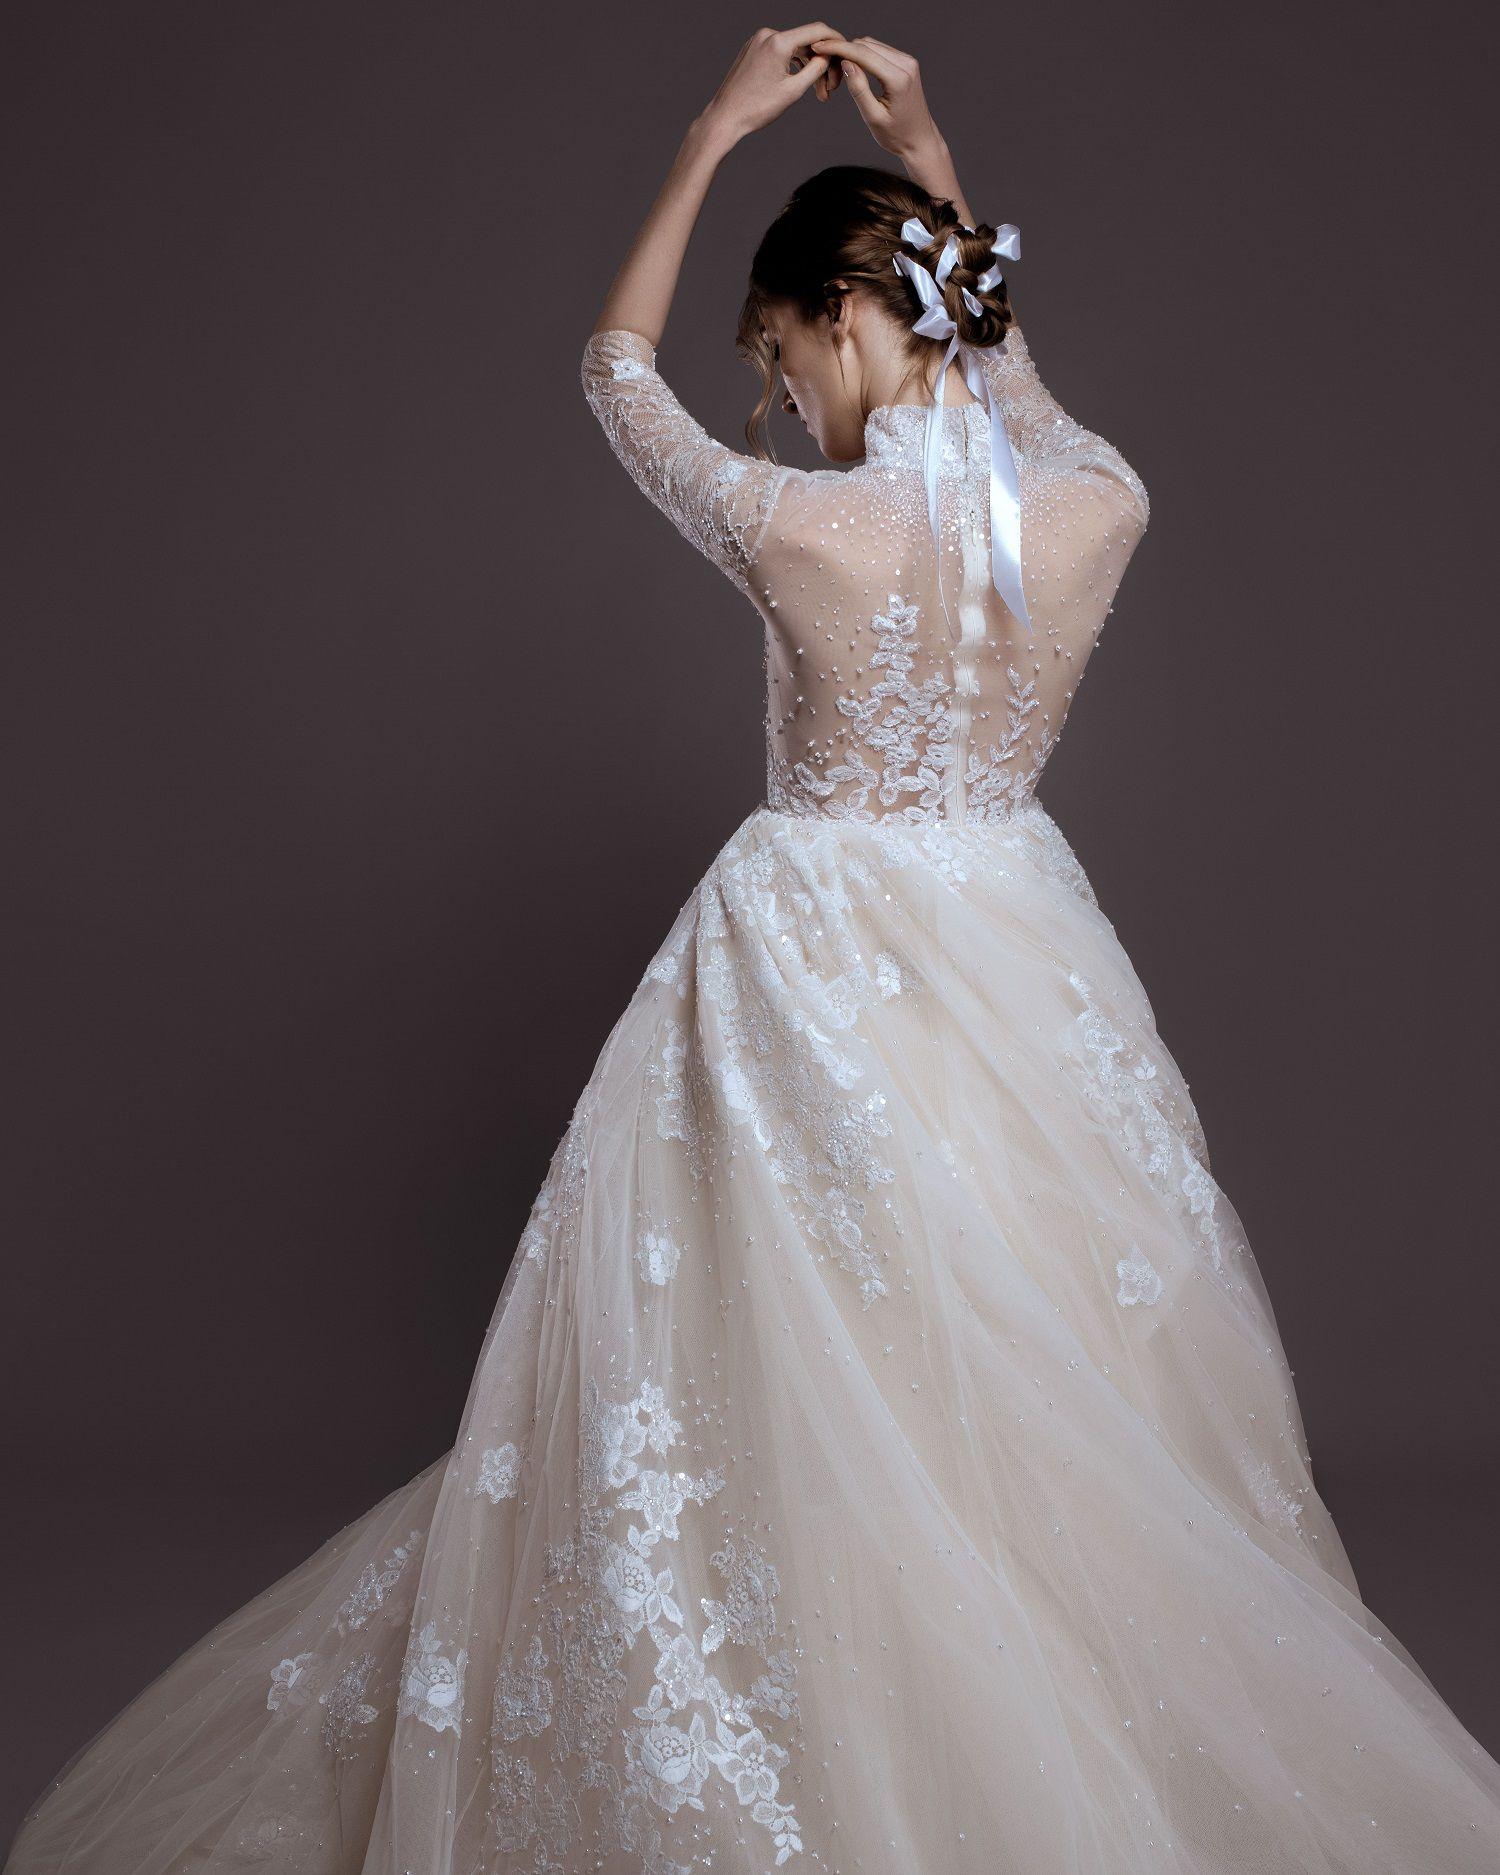 6bd26518a4f GEORGES HOBEIKA Bridal Spring Summer 2019 Available at Boutiques  TheRose   Bridal  SpringSummer  GEORGESHOBEIKA